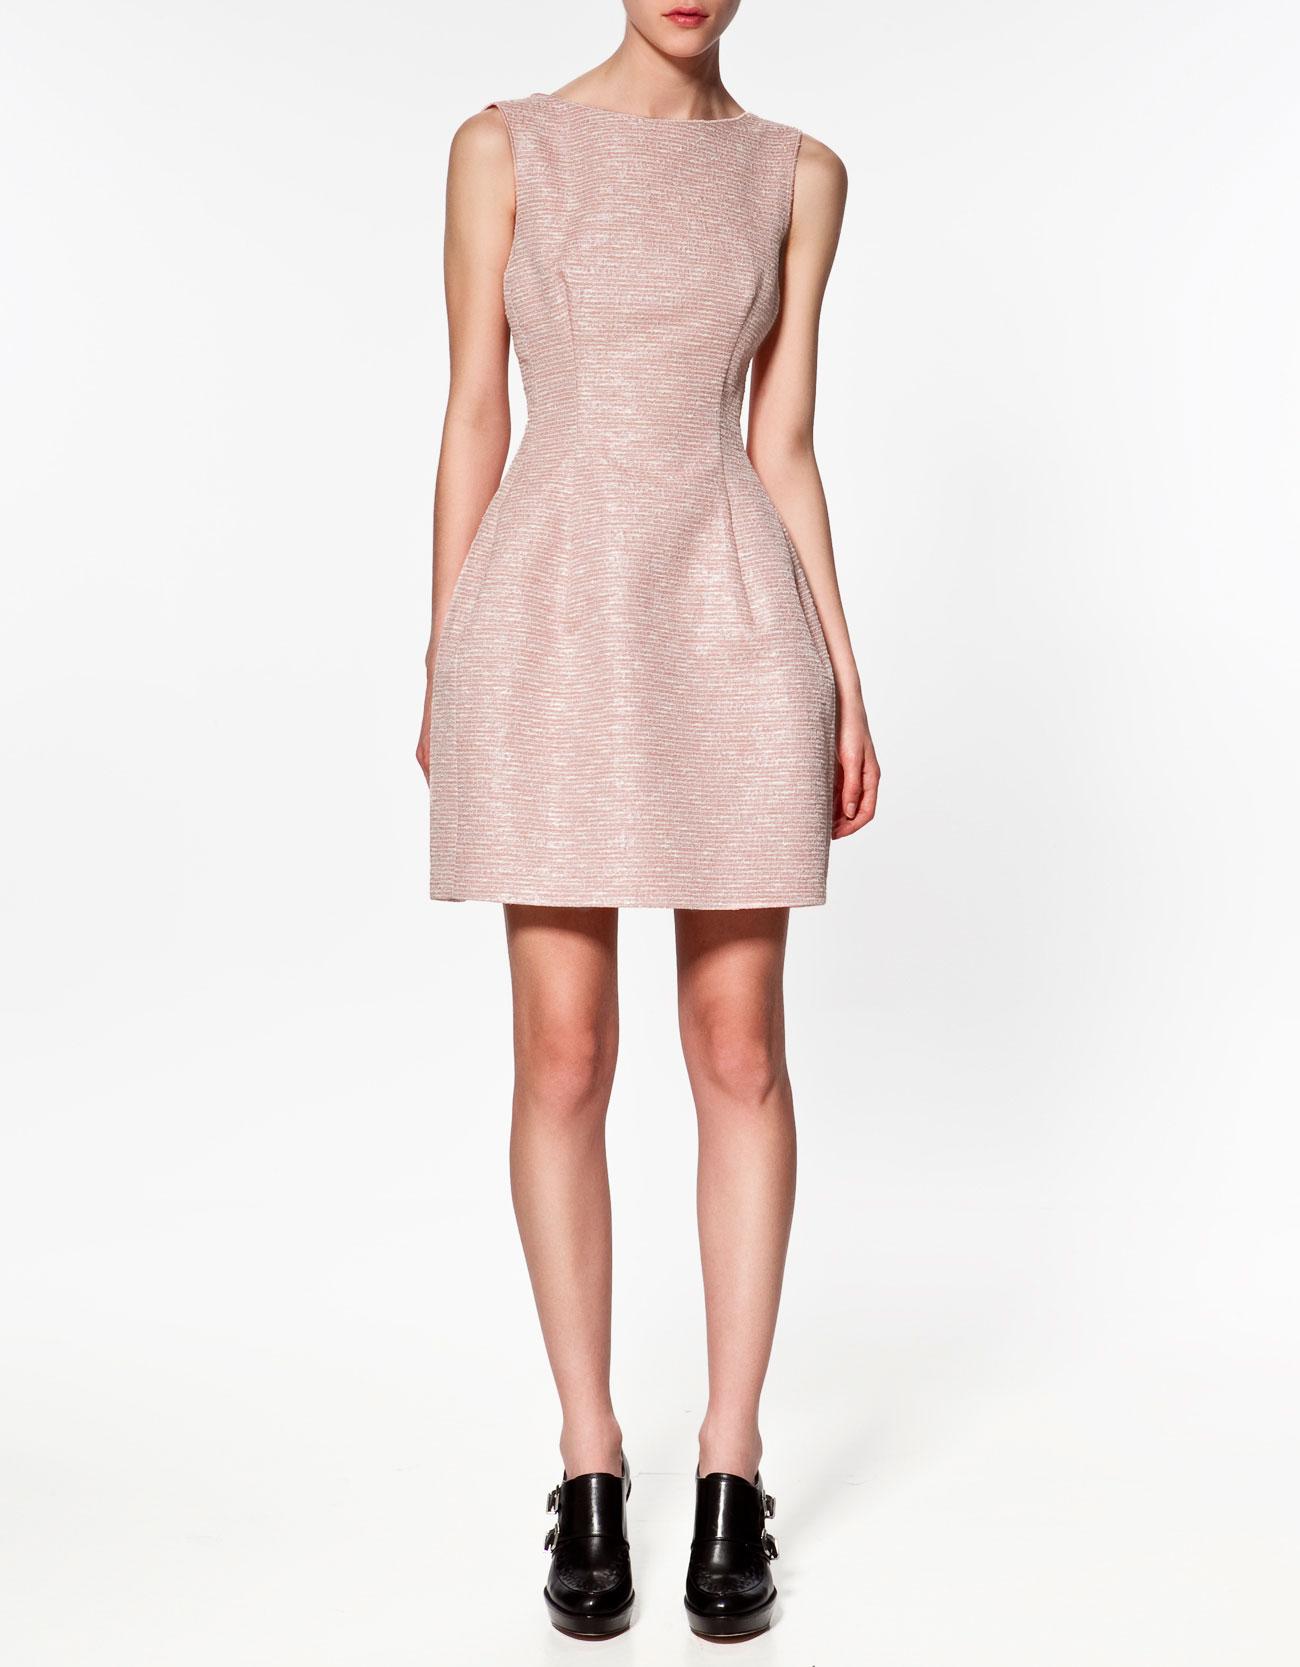 Zara Tulip Dress Zara Tulip Dress in Pink View